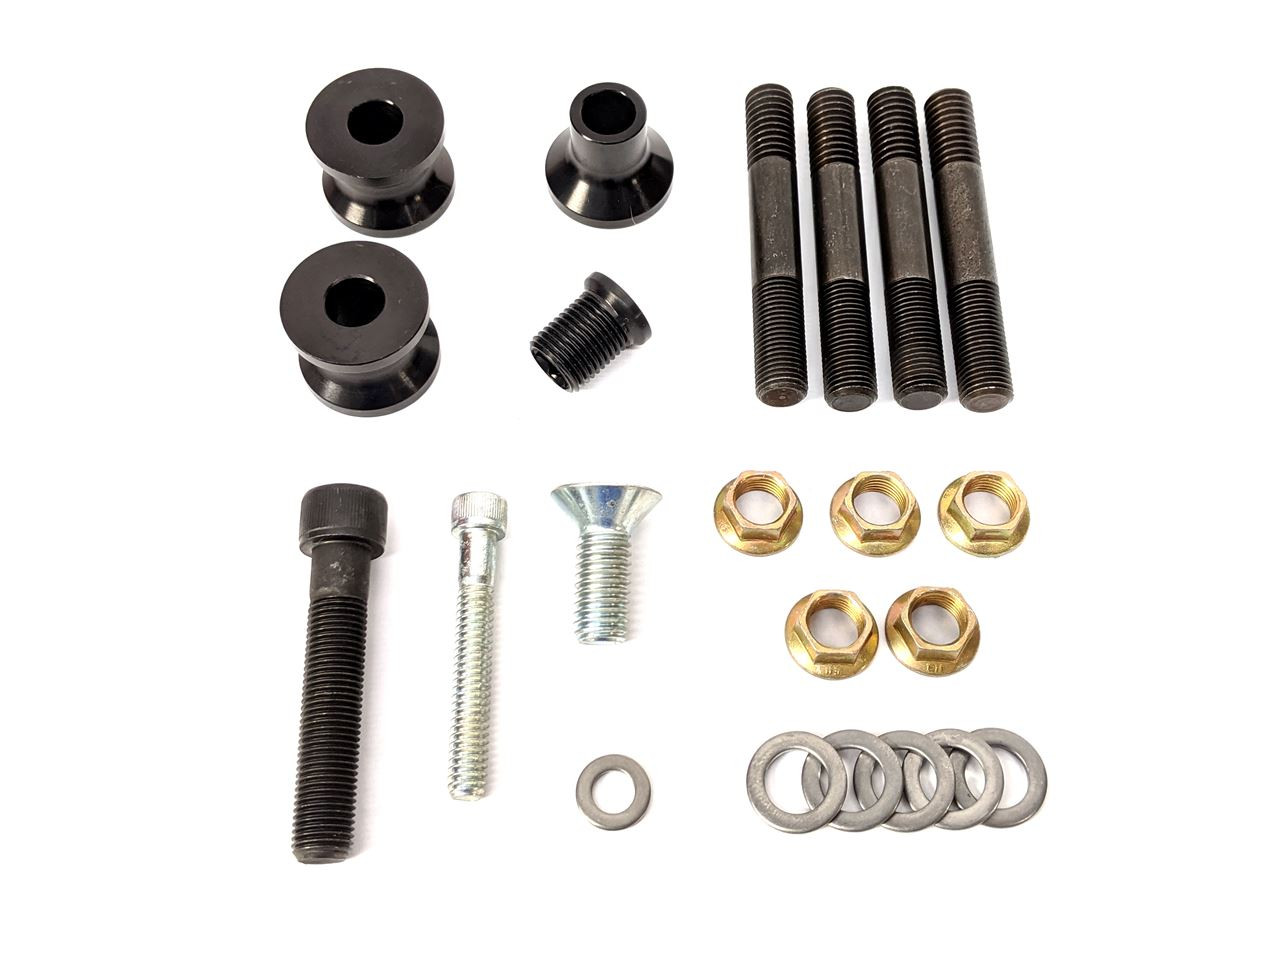 TFX Hemi Idler Mounting Kit DMPE 200-025-99-1477